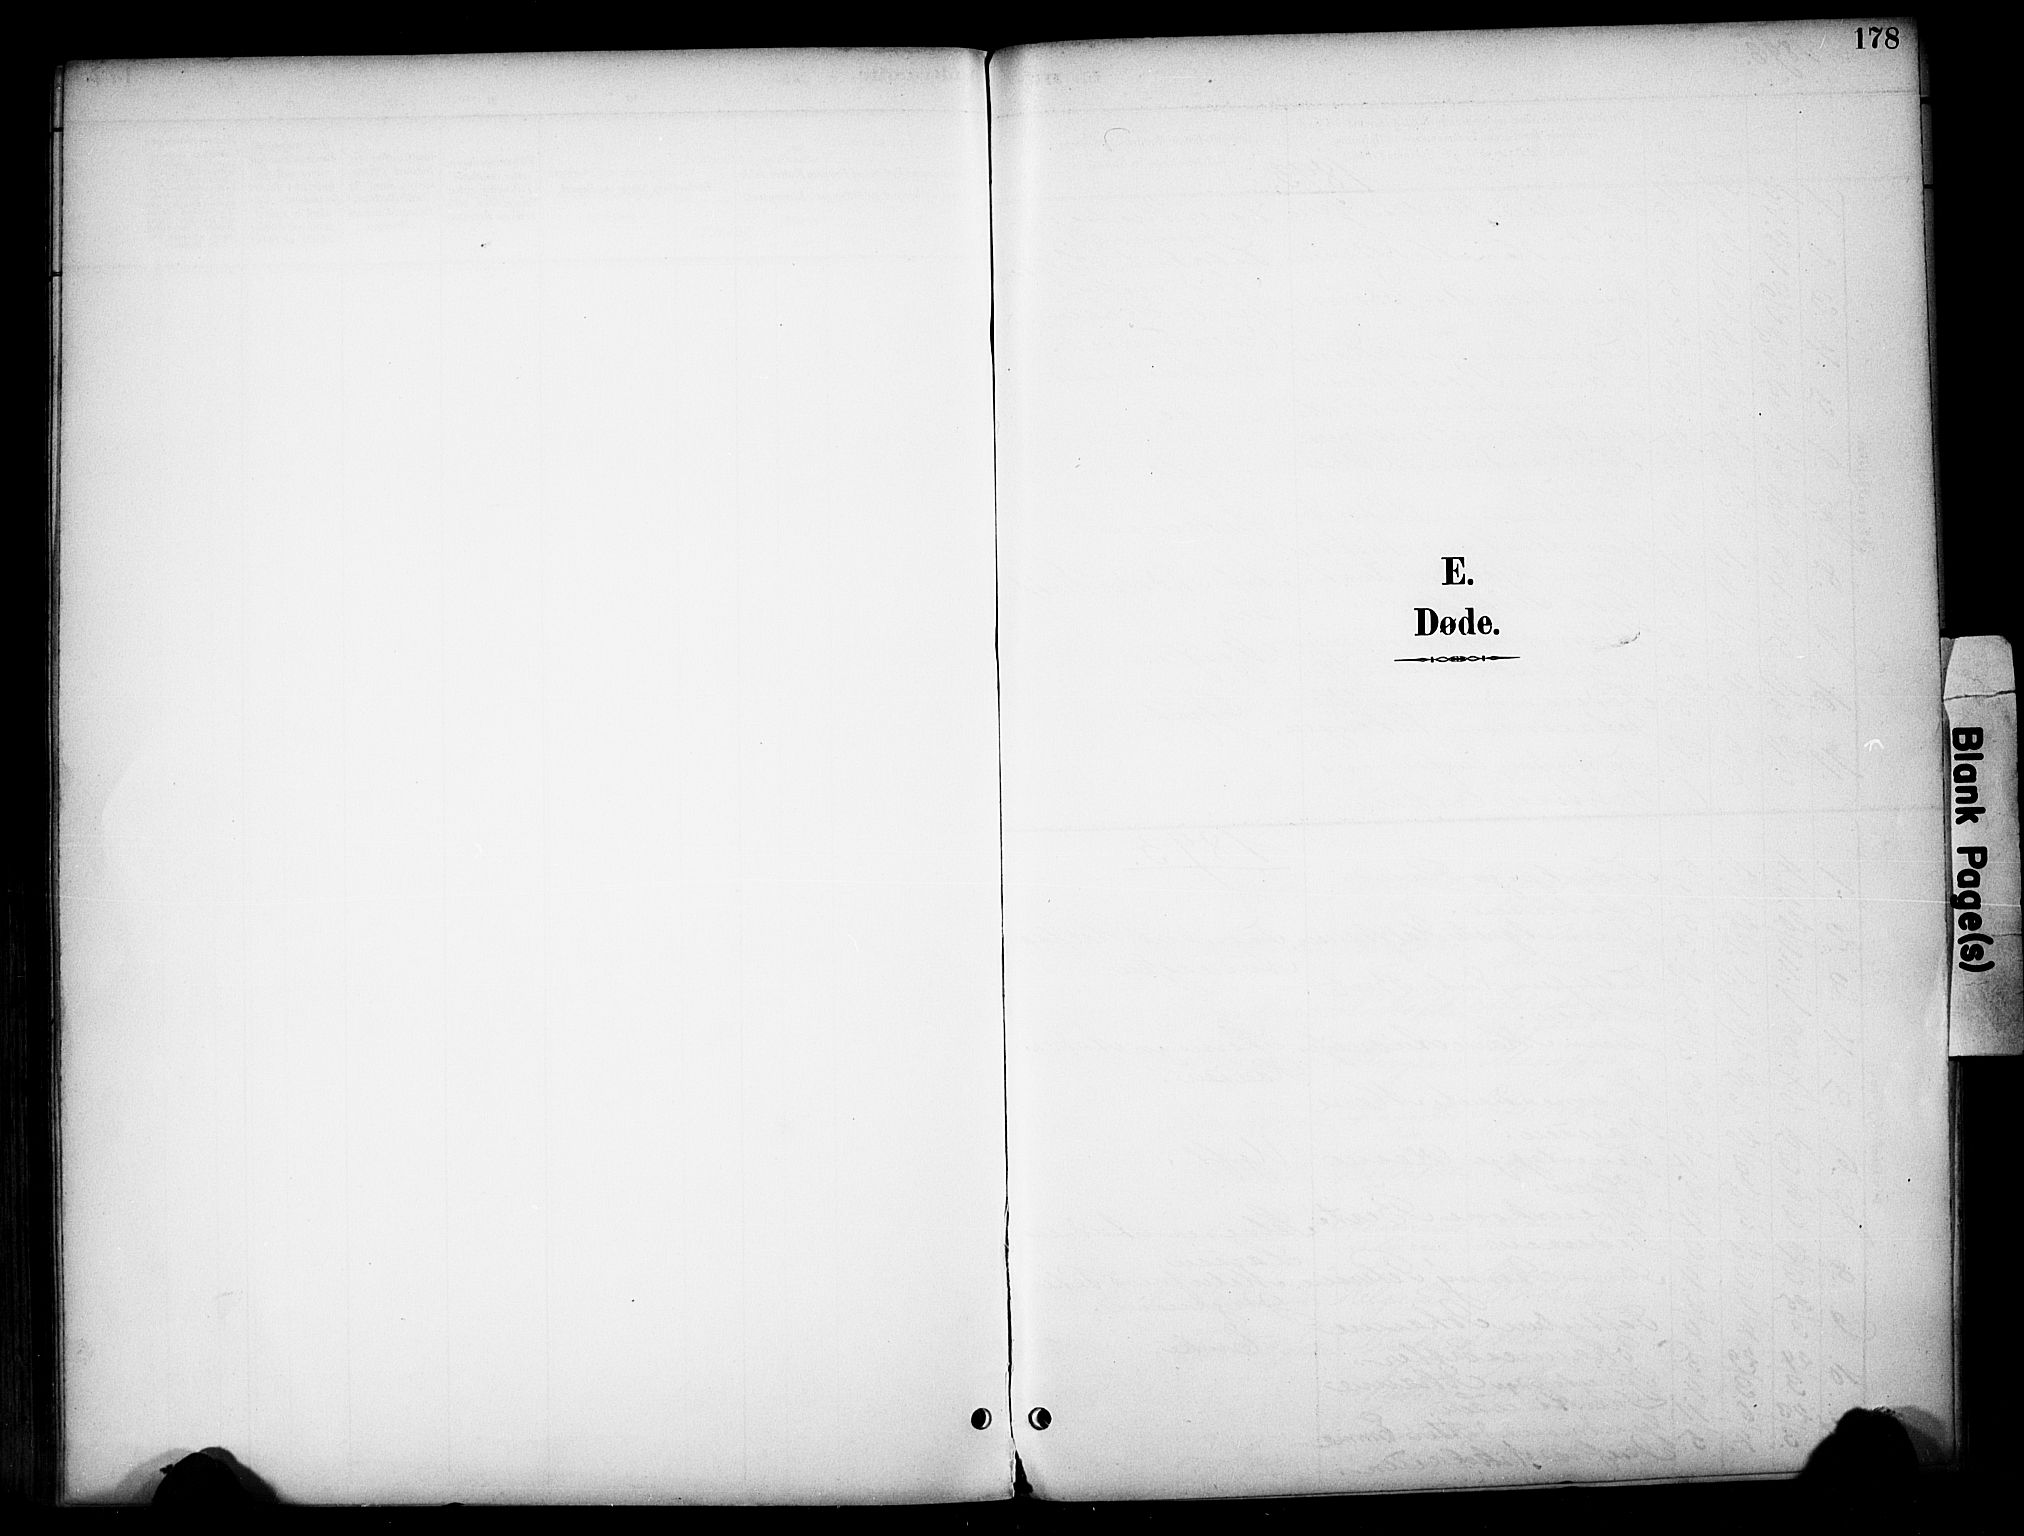 SAH, Vardal prestekontor, H/Ha/Haa/L0012: Ministerialbok nr. 12, 1893-1904, s. 178